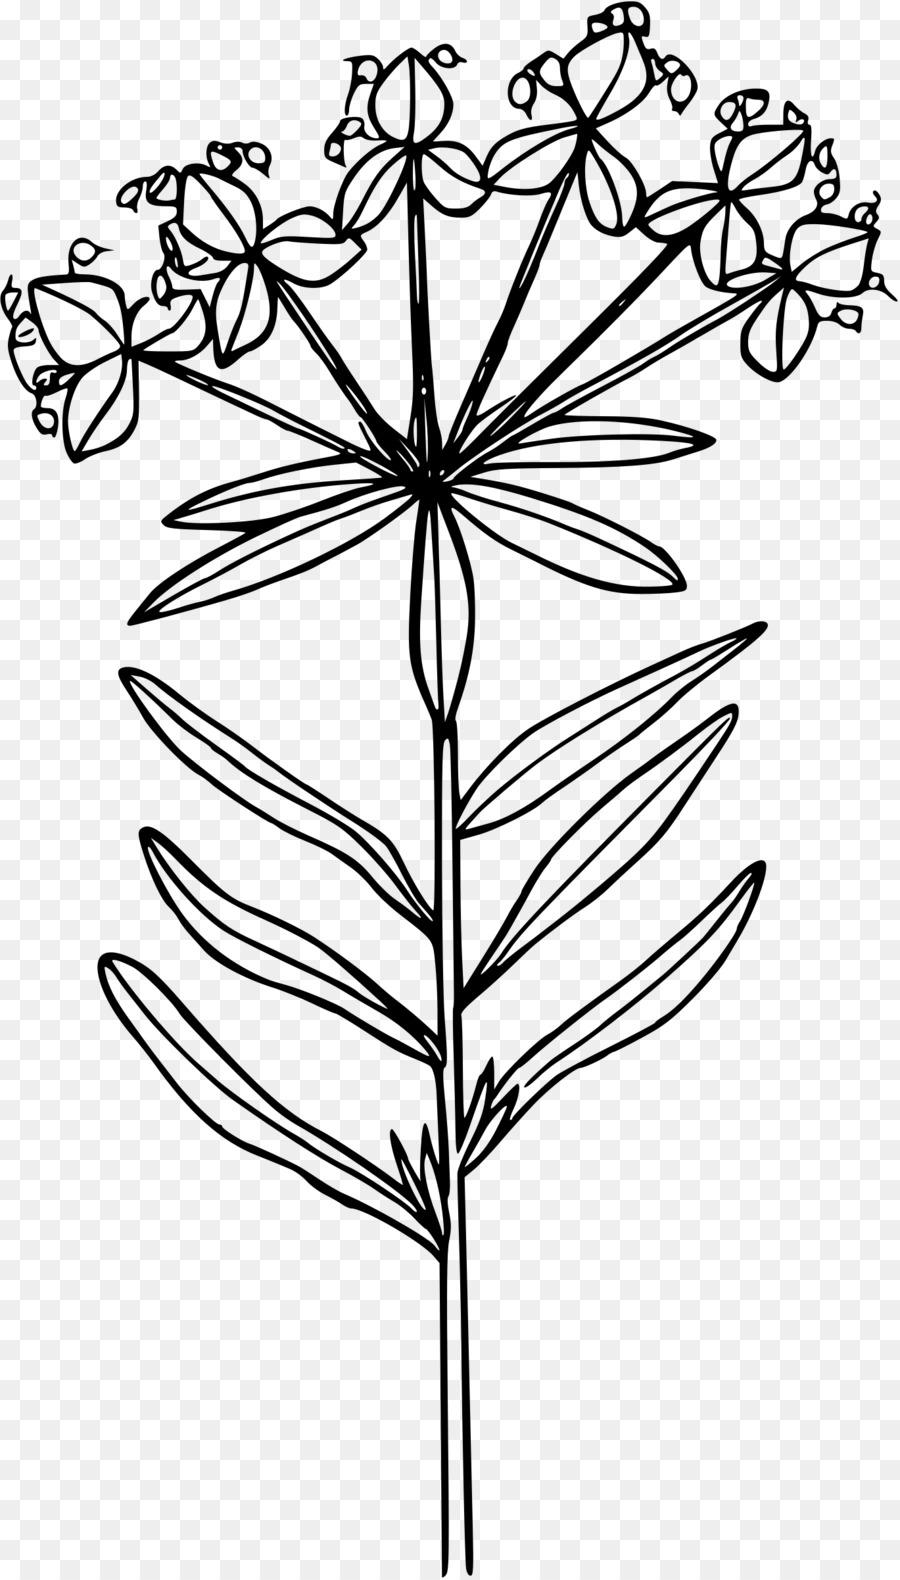 900x1580 Euphorbia Esula Line Art Drawing Clip Art